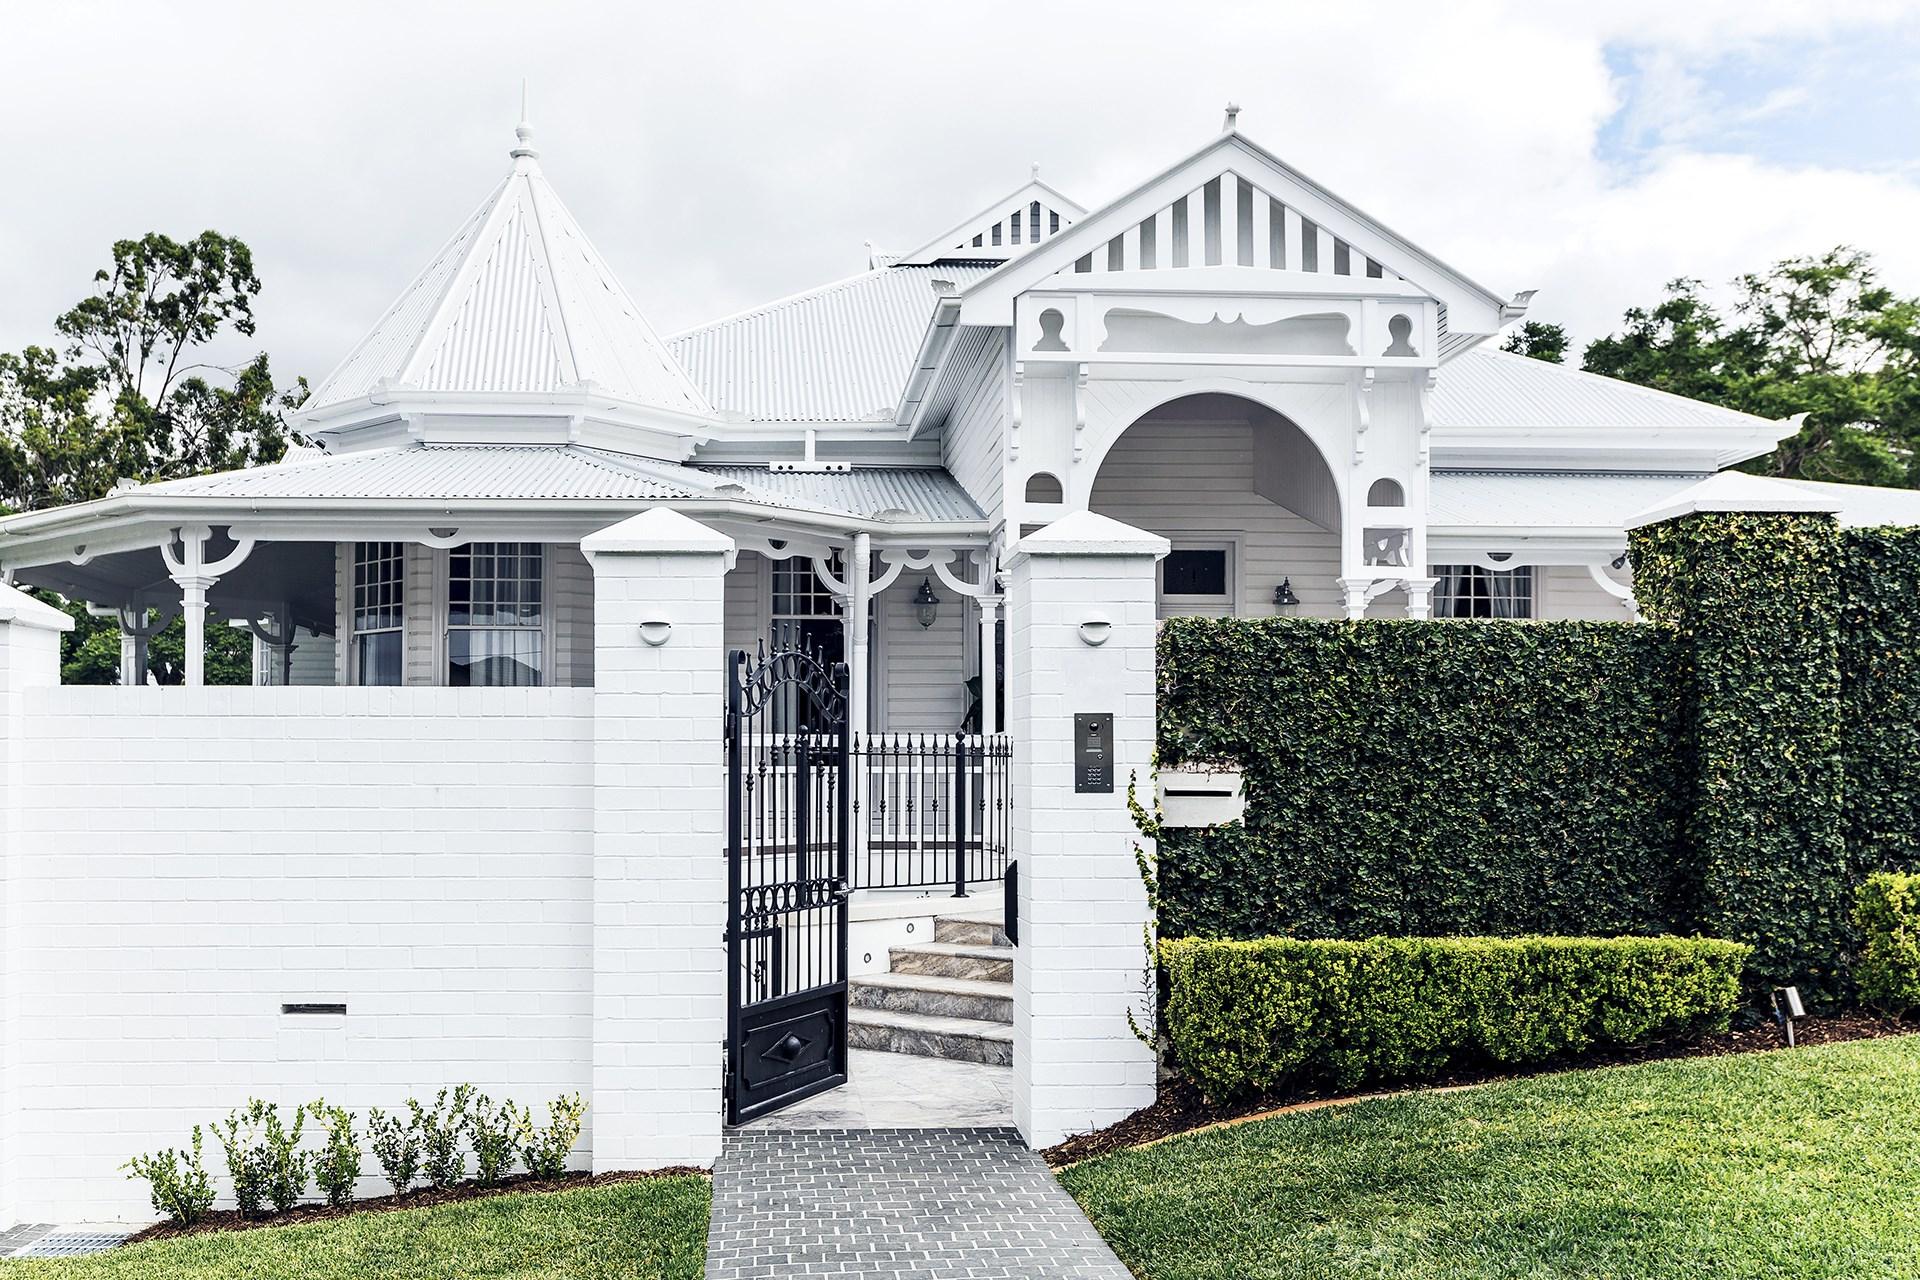 [Classic Queenslander becomes a fresh family sanctuary](http://www.homestolove.com.au/a-stately-queenslander-becomes-a-fresh-family-sanctuary-2578). Photo: Maree Homer / *Australian House & Garden*